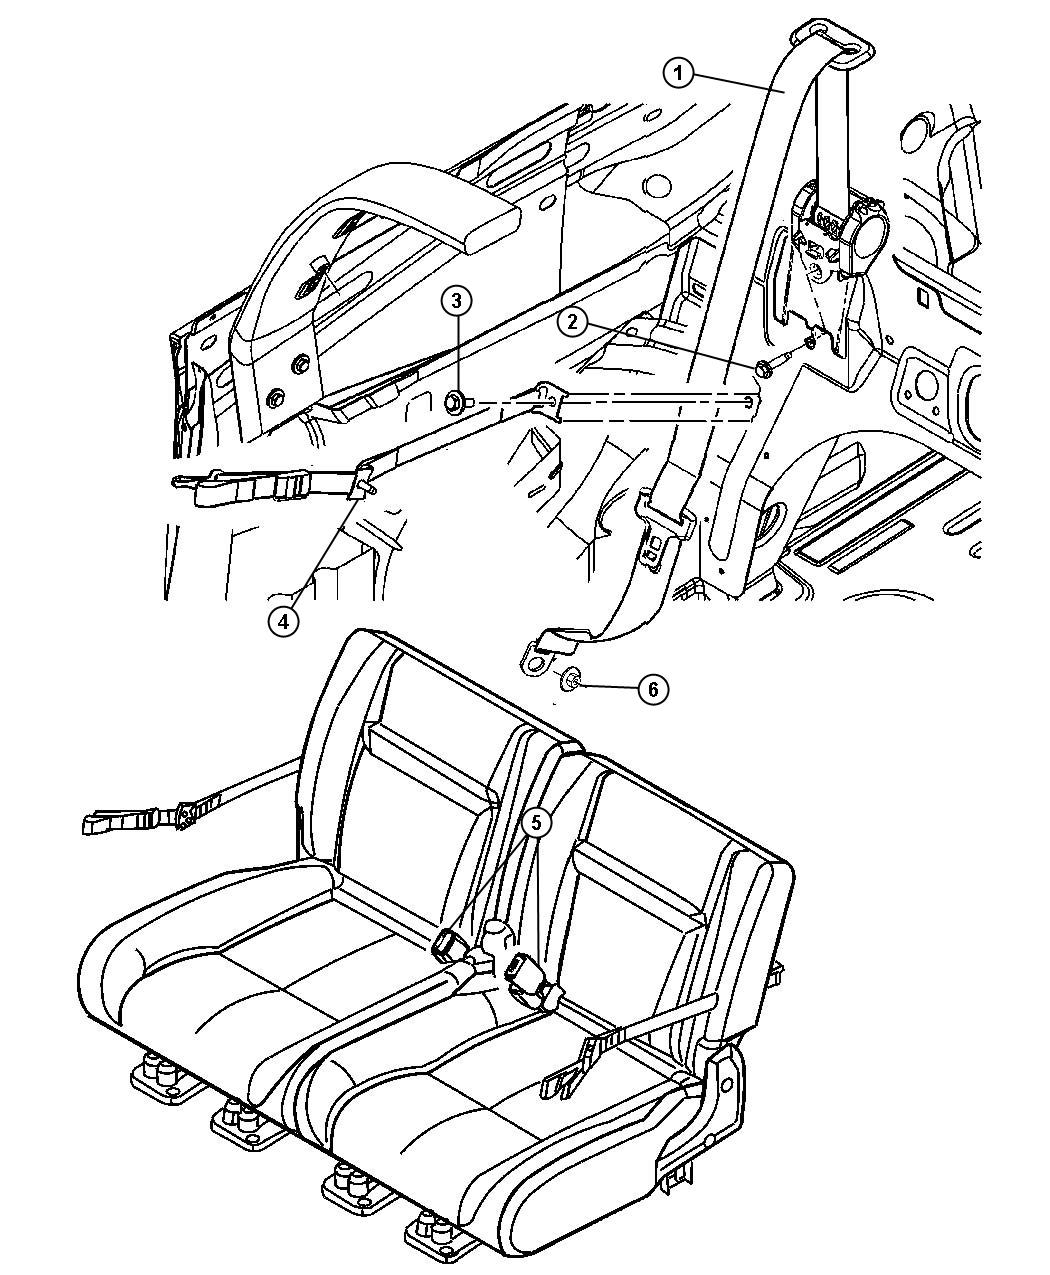 chrysler pt cruiser seat belt rear da trim